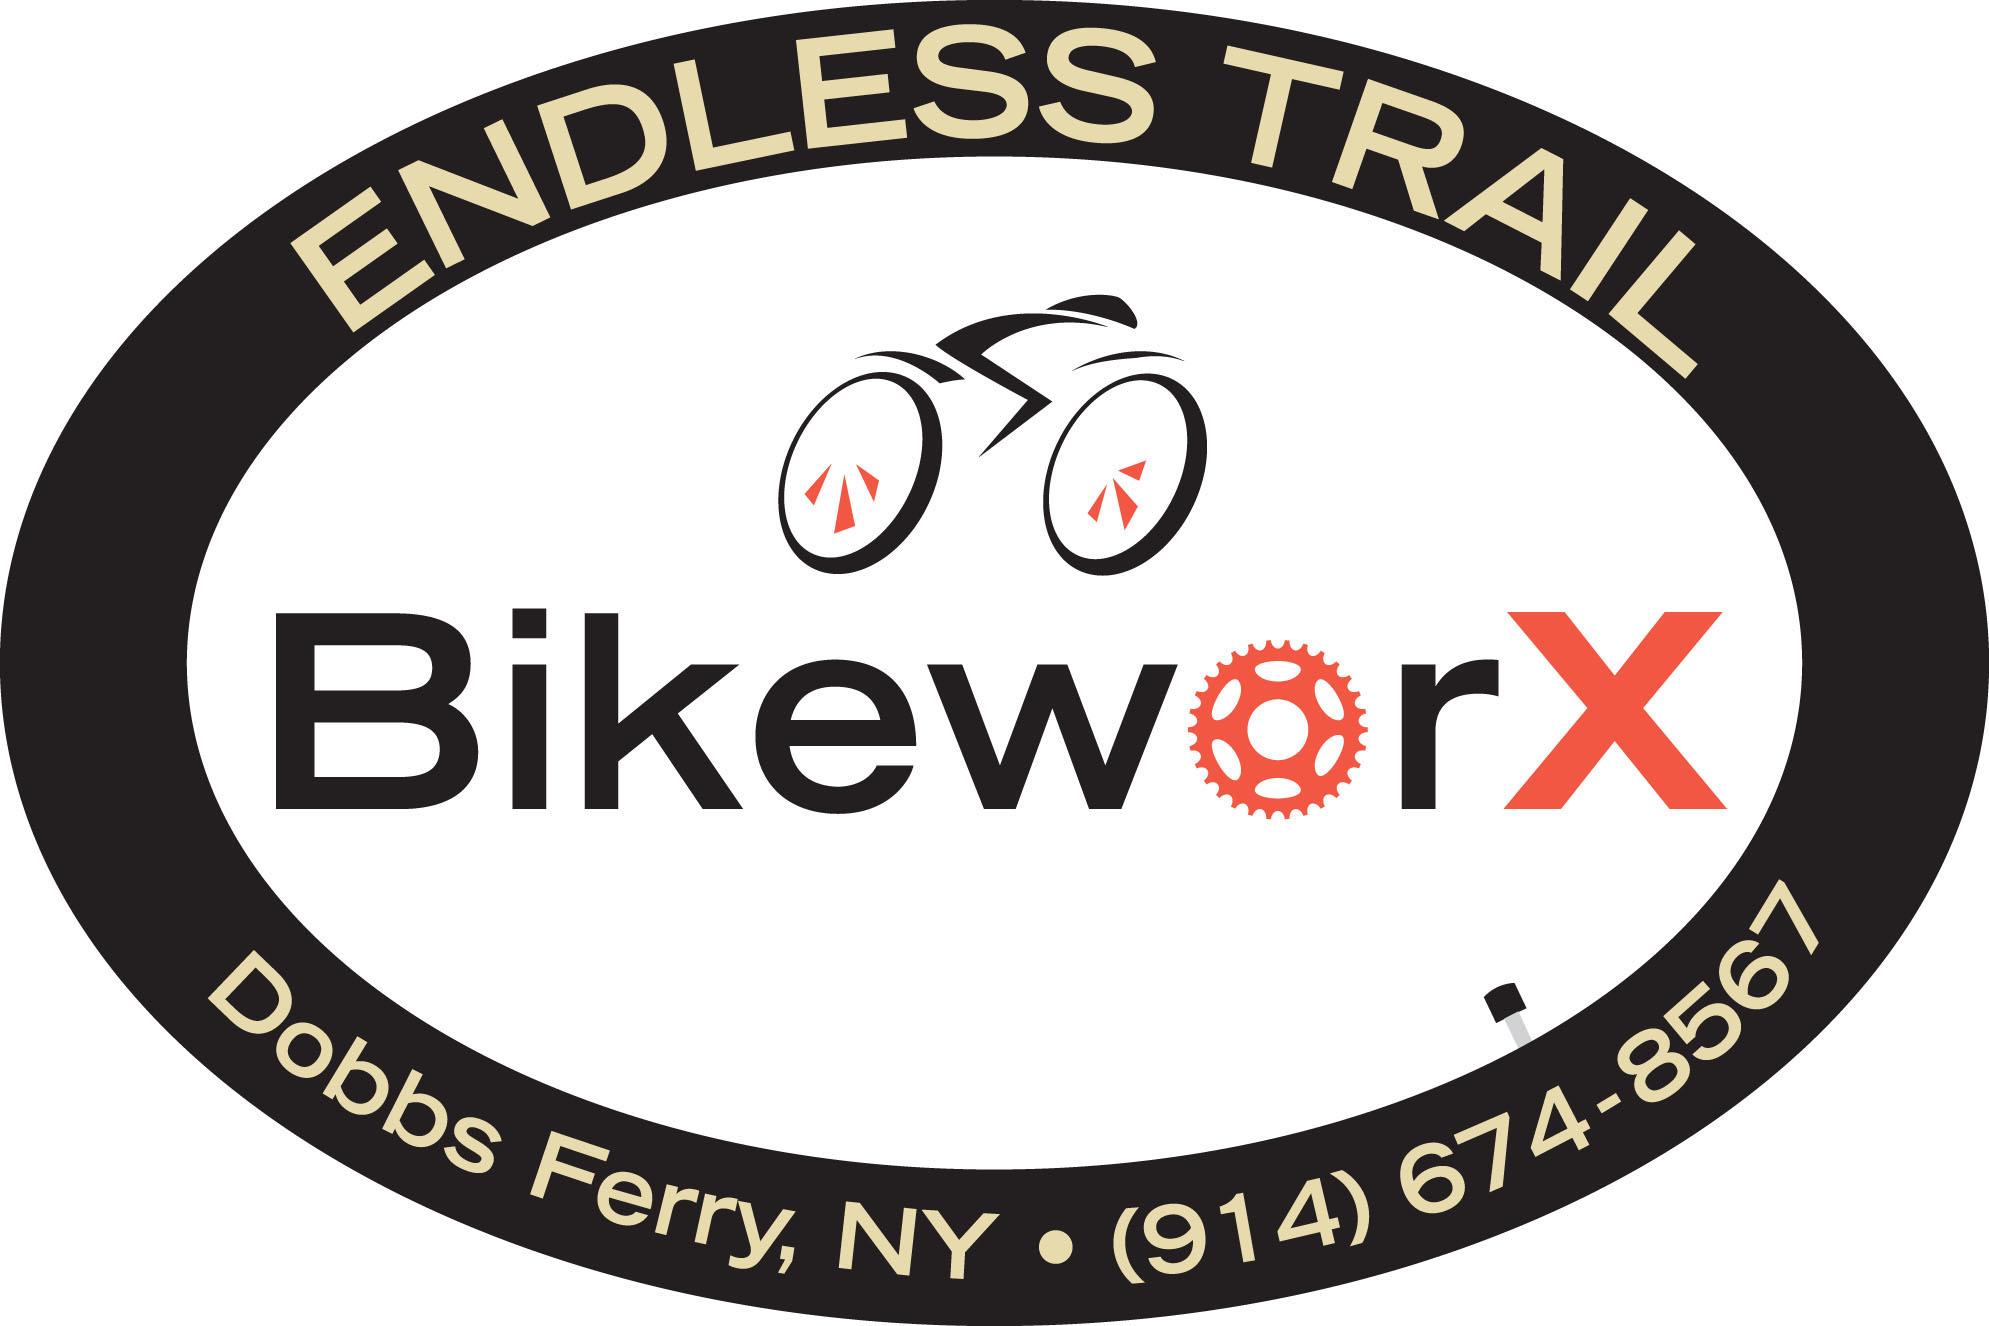 Endless Trail Bikeworkx Dobbs Ferry NY